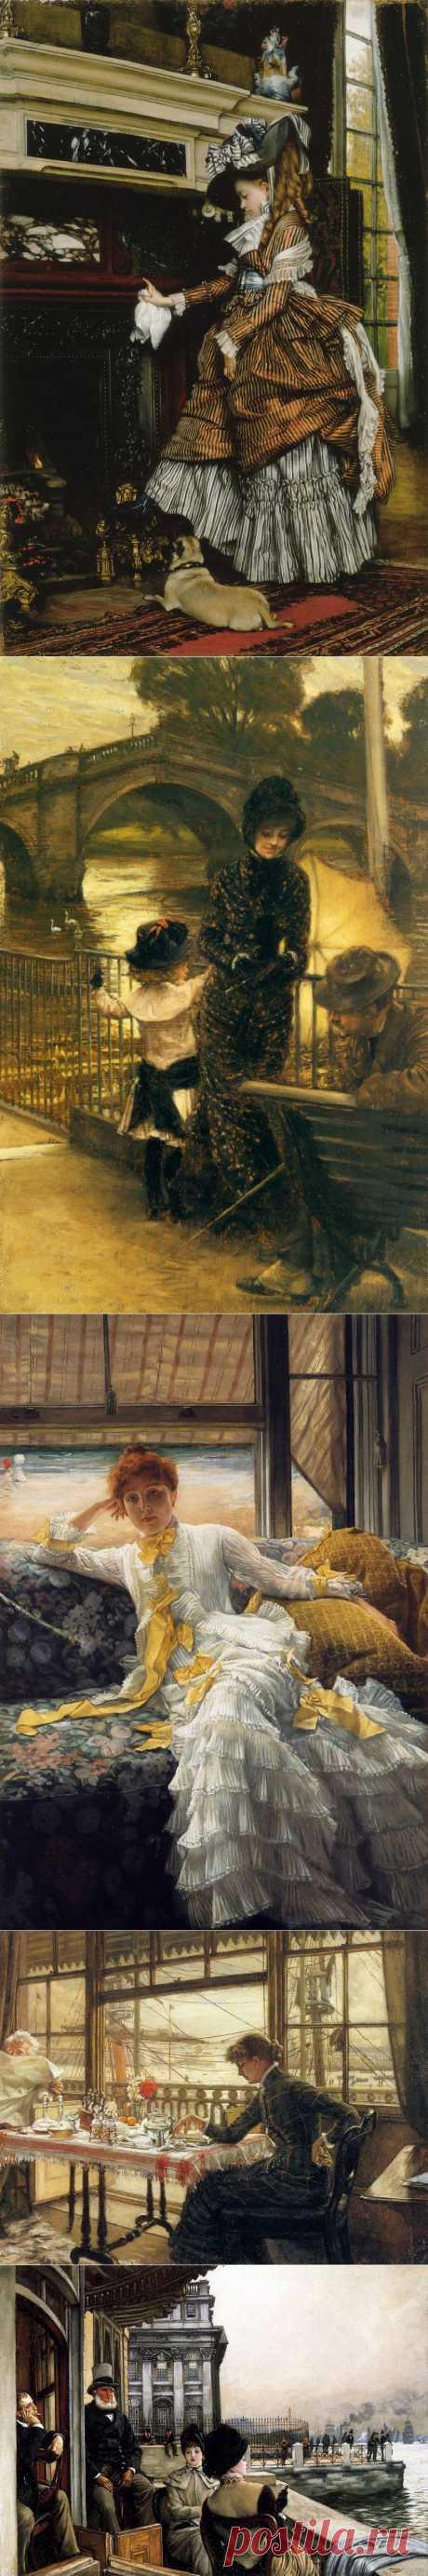 Французский художник, работал в Англии - Джеймс Тиссо (1836-1902)